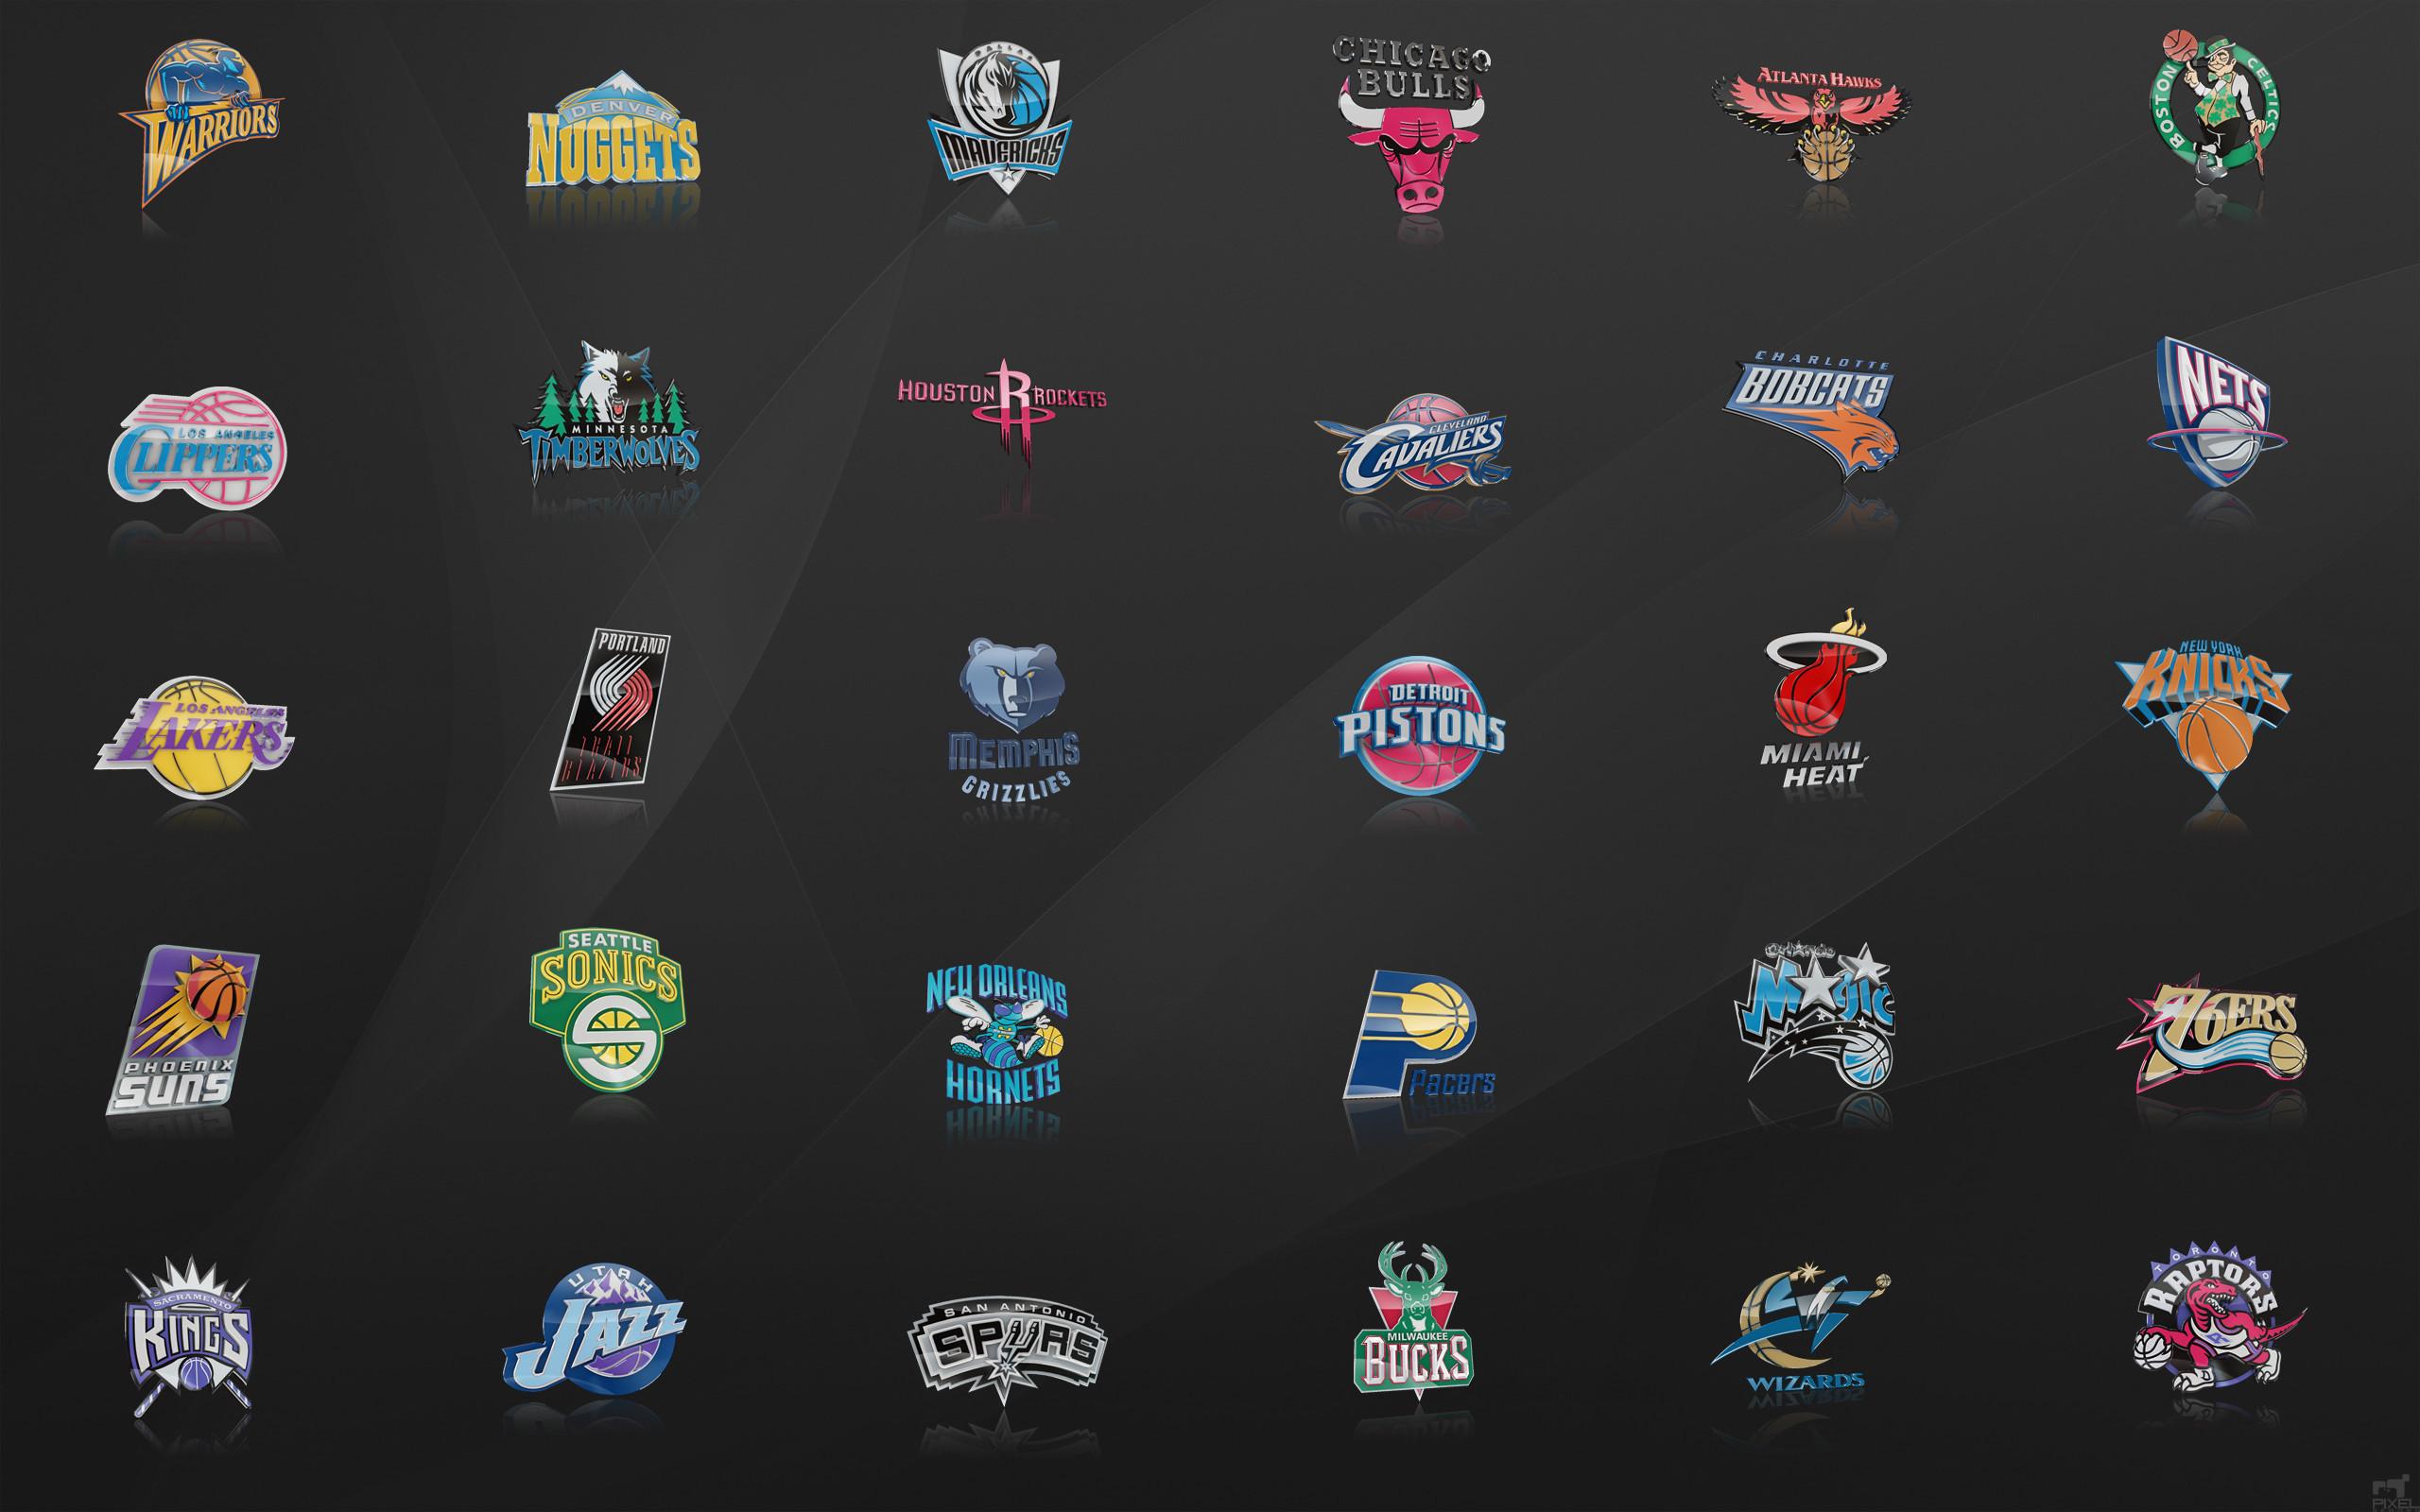 NBA Team Logos Wallpaper 2018 (71+ images)